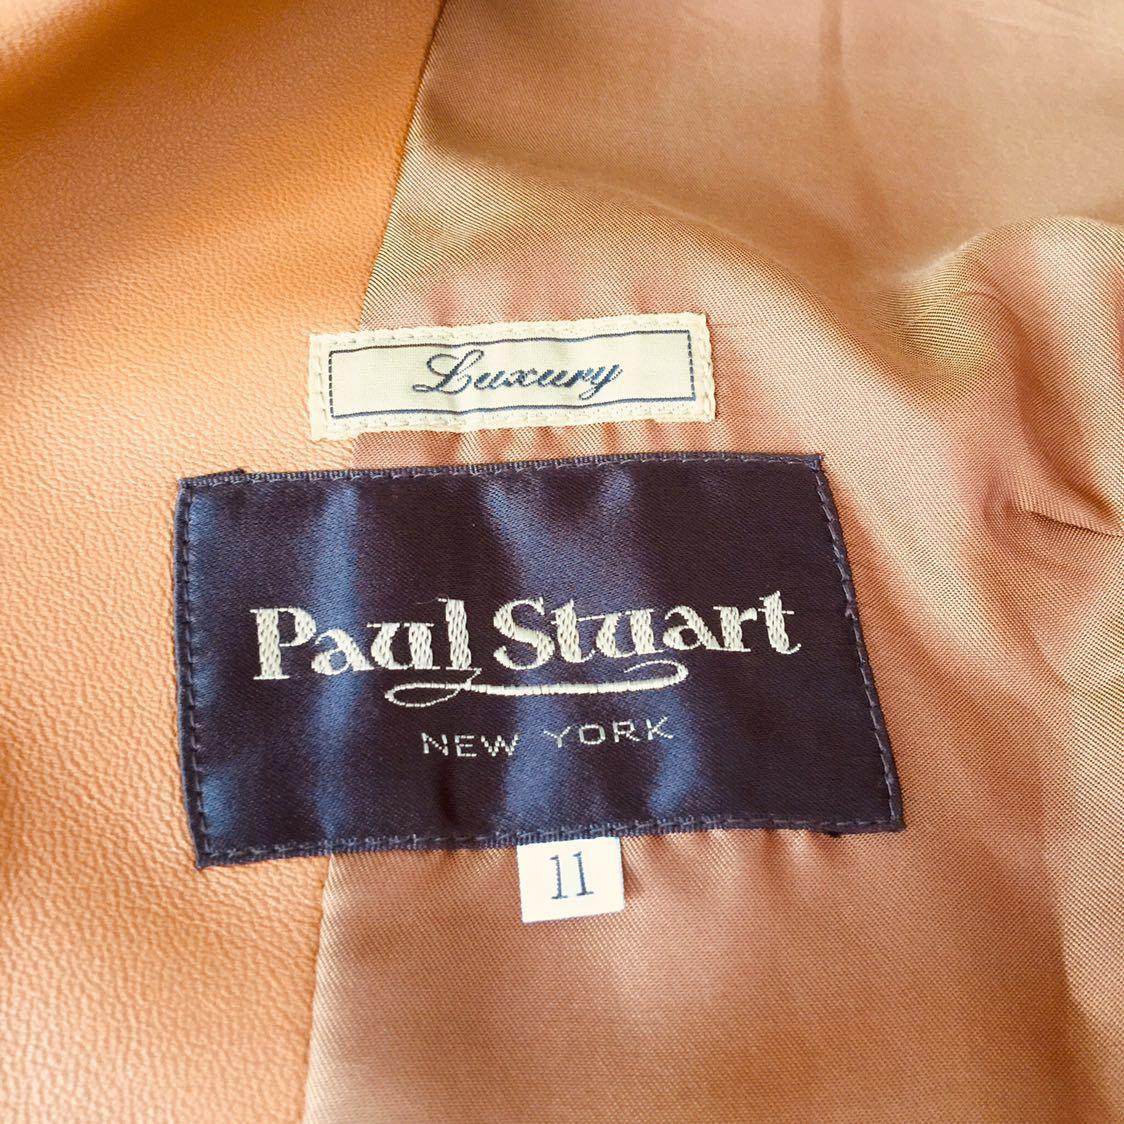 Paul Stuart ポールスチュアート レザージャケット 11AR(羊革)_画像2